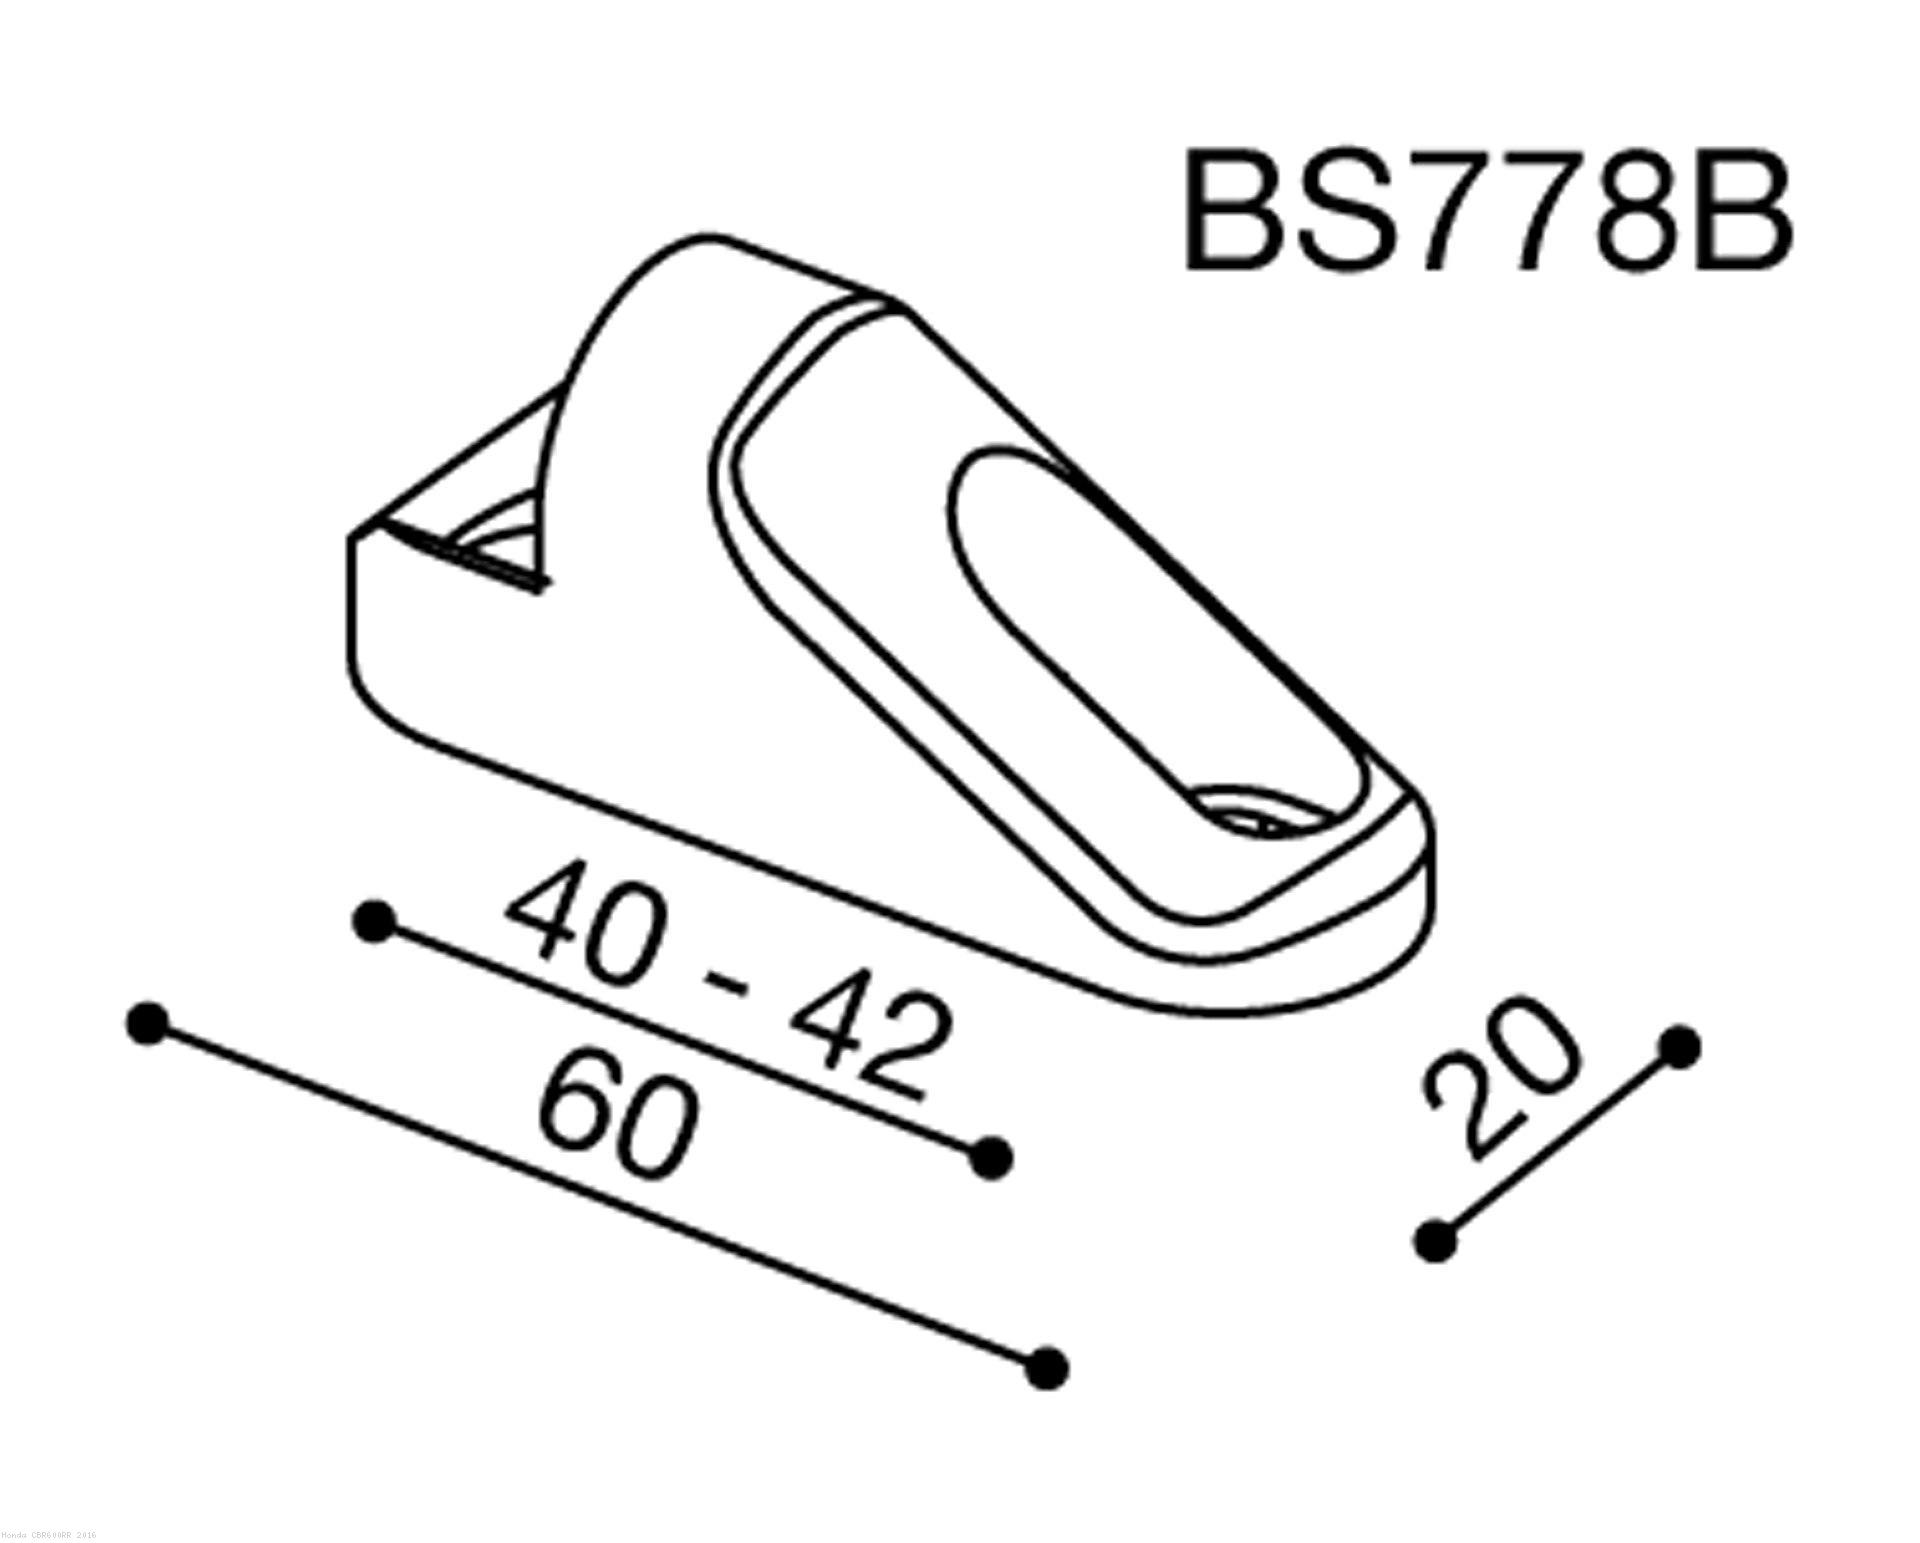 Rizoma Mirror Adapter Bs778b Honda Cbr600rr 2016 Turn Signal Wiring Diagram